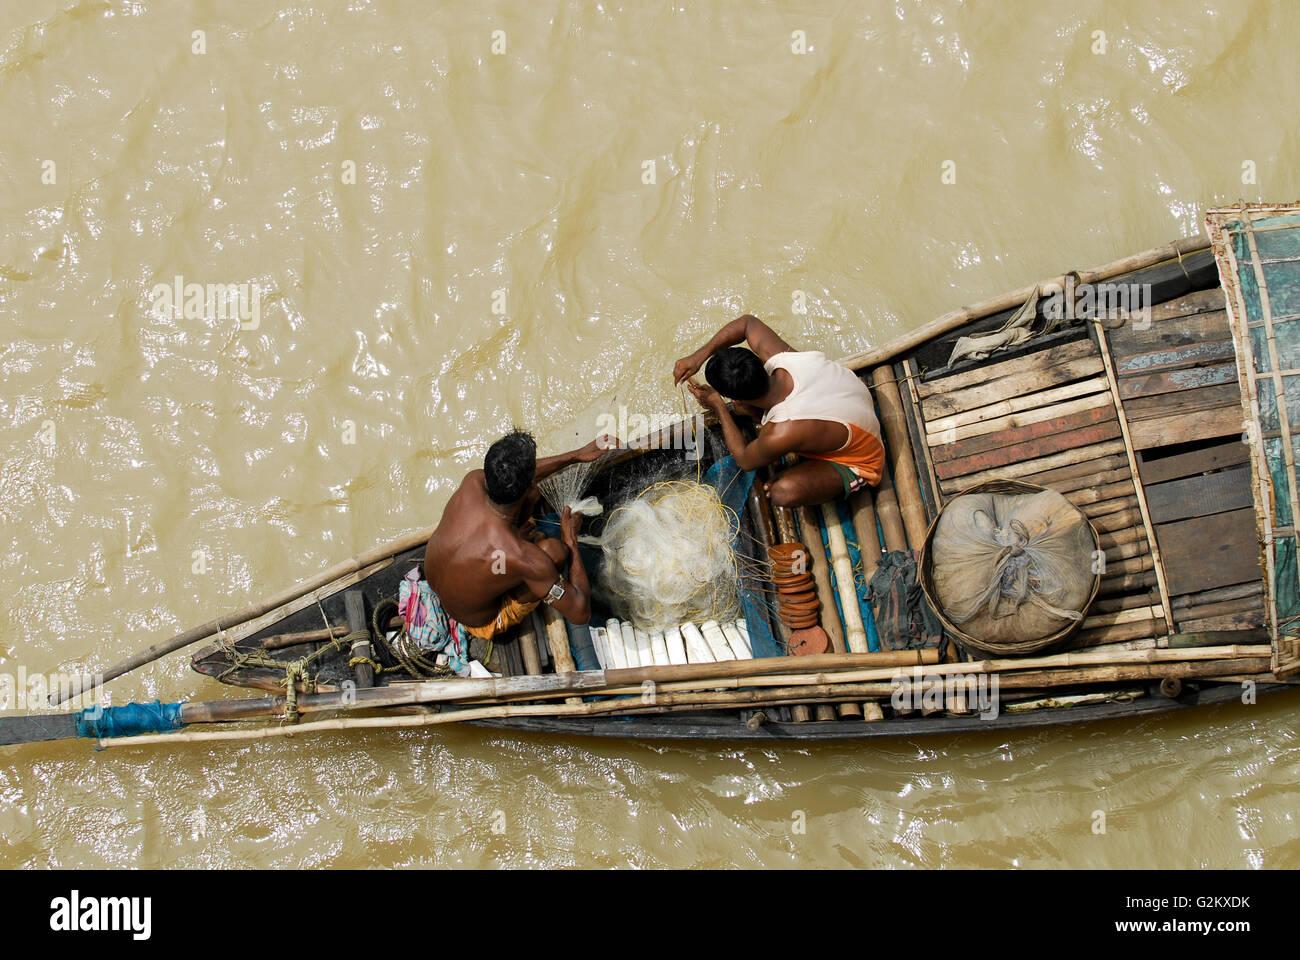 INDIA Westbengal Calcutta Kolkata, fisherman in boat on river Hooghli / INDIEN Kalkutta Kolkata, Fischer in Holzboot - Stock Image